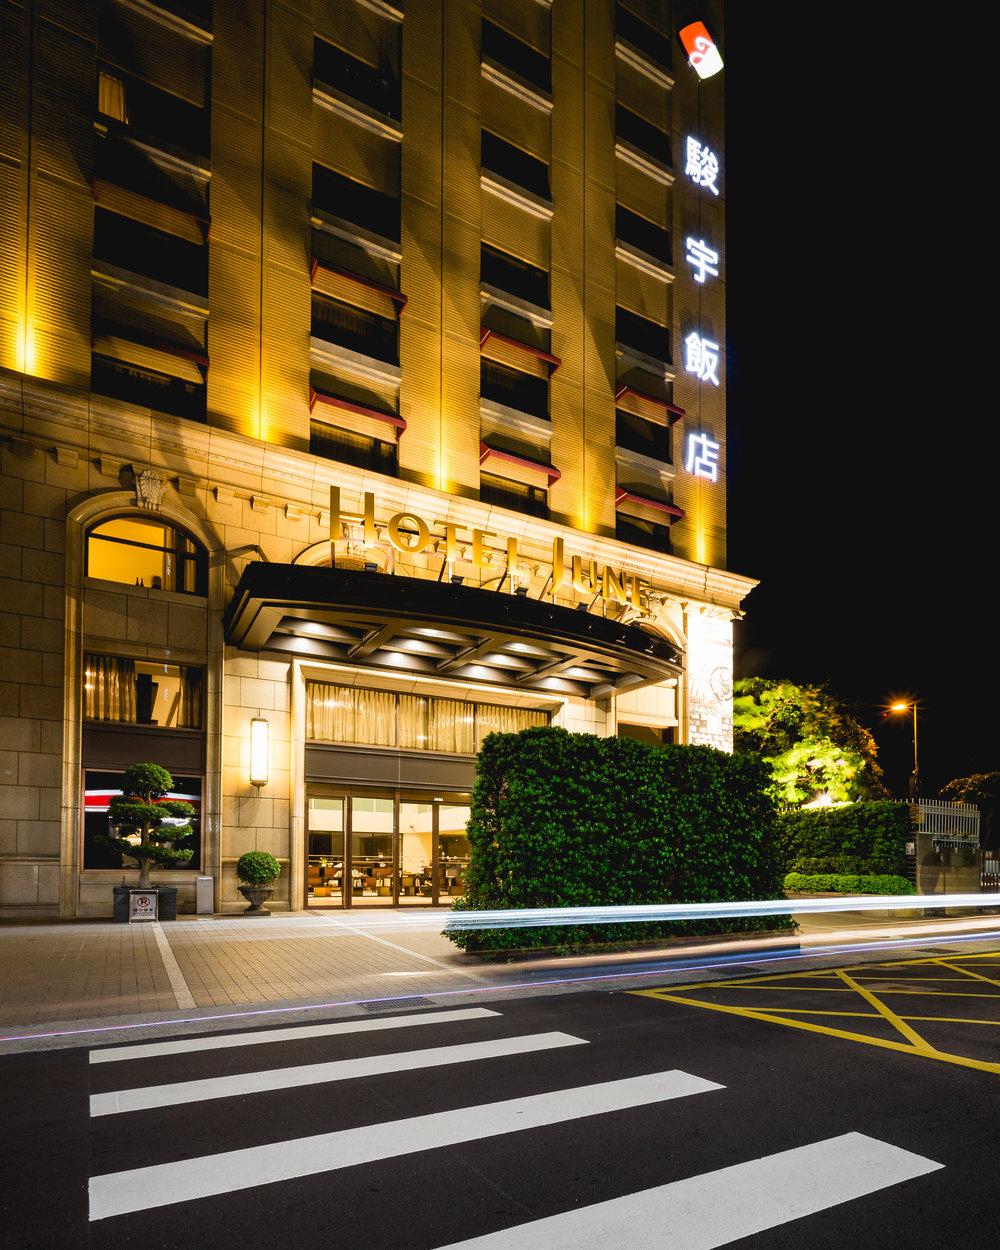 2018.09.14_June-Hotel-3027.jpg